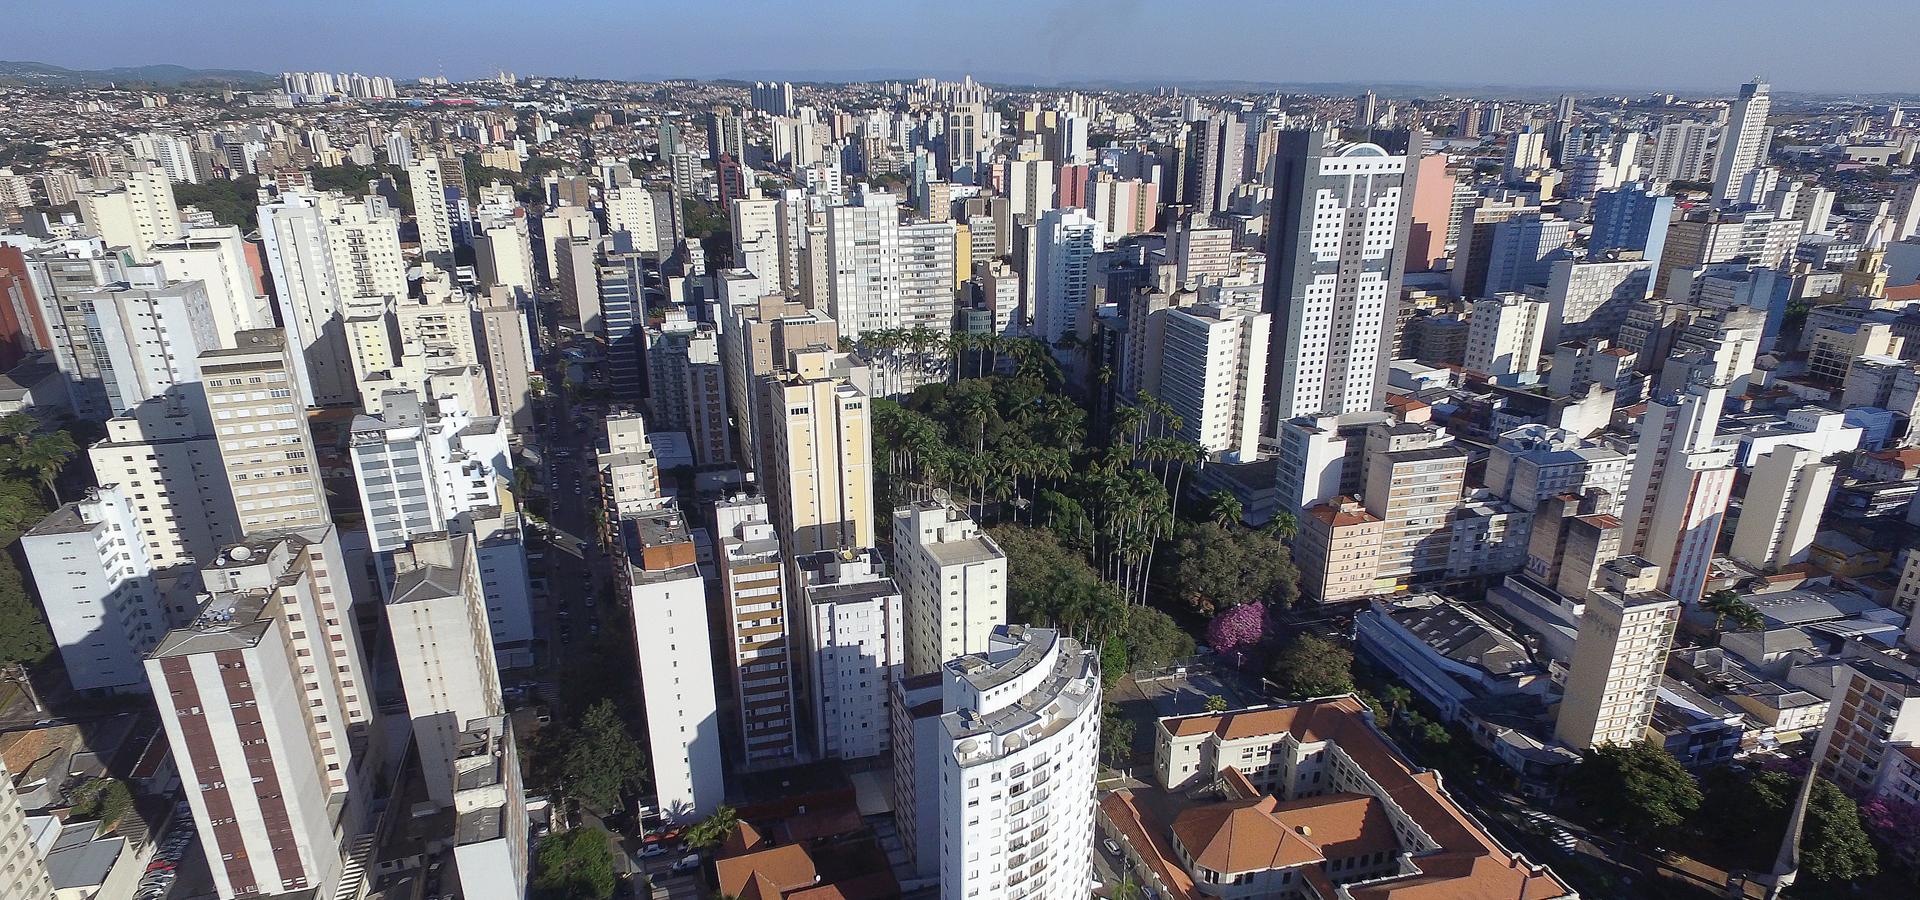 Campinas, São Paulo, Brazil